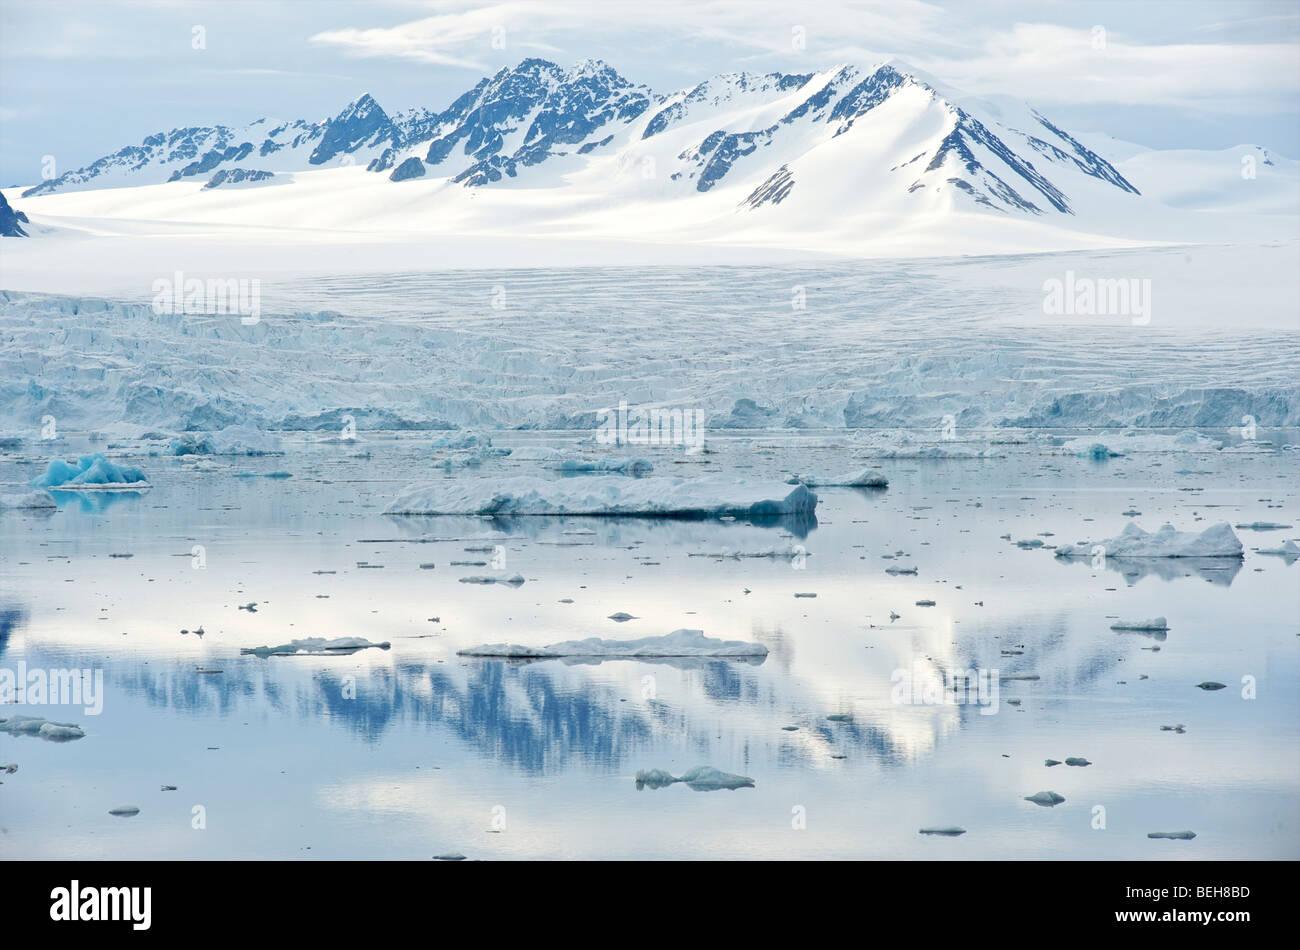 Spitsbergen, Svalbard, 14th of July glacier - Stock Image